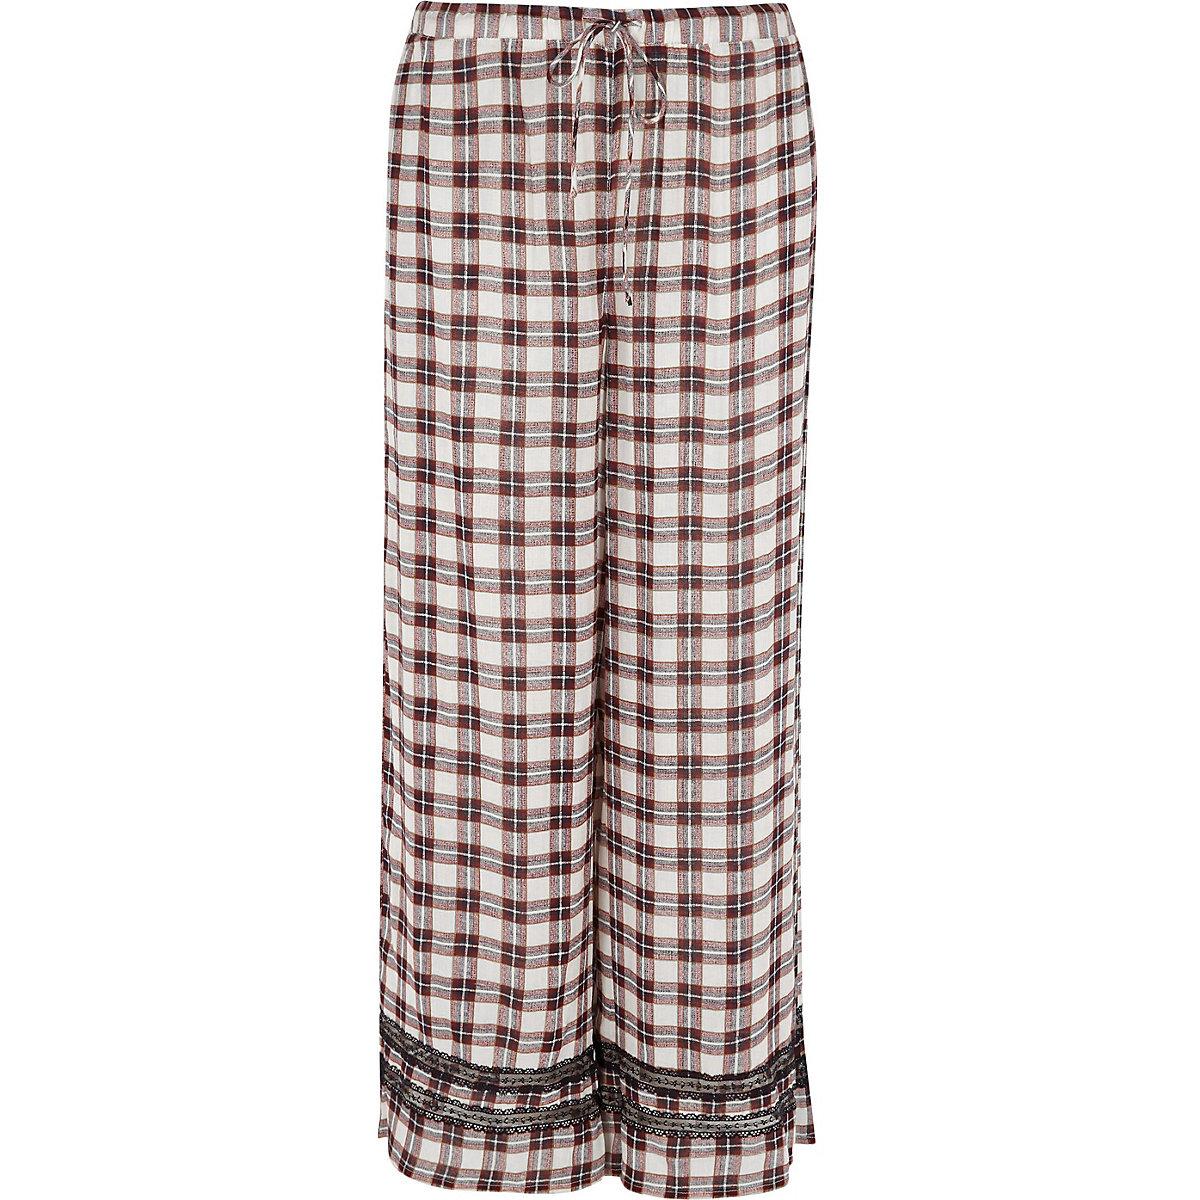 Red check lace trim pajama pants